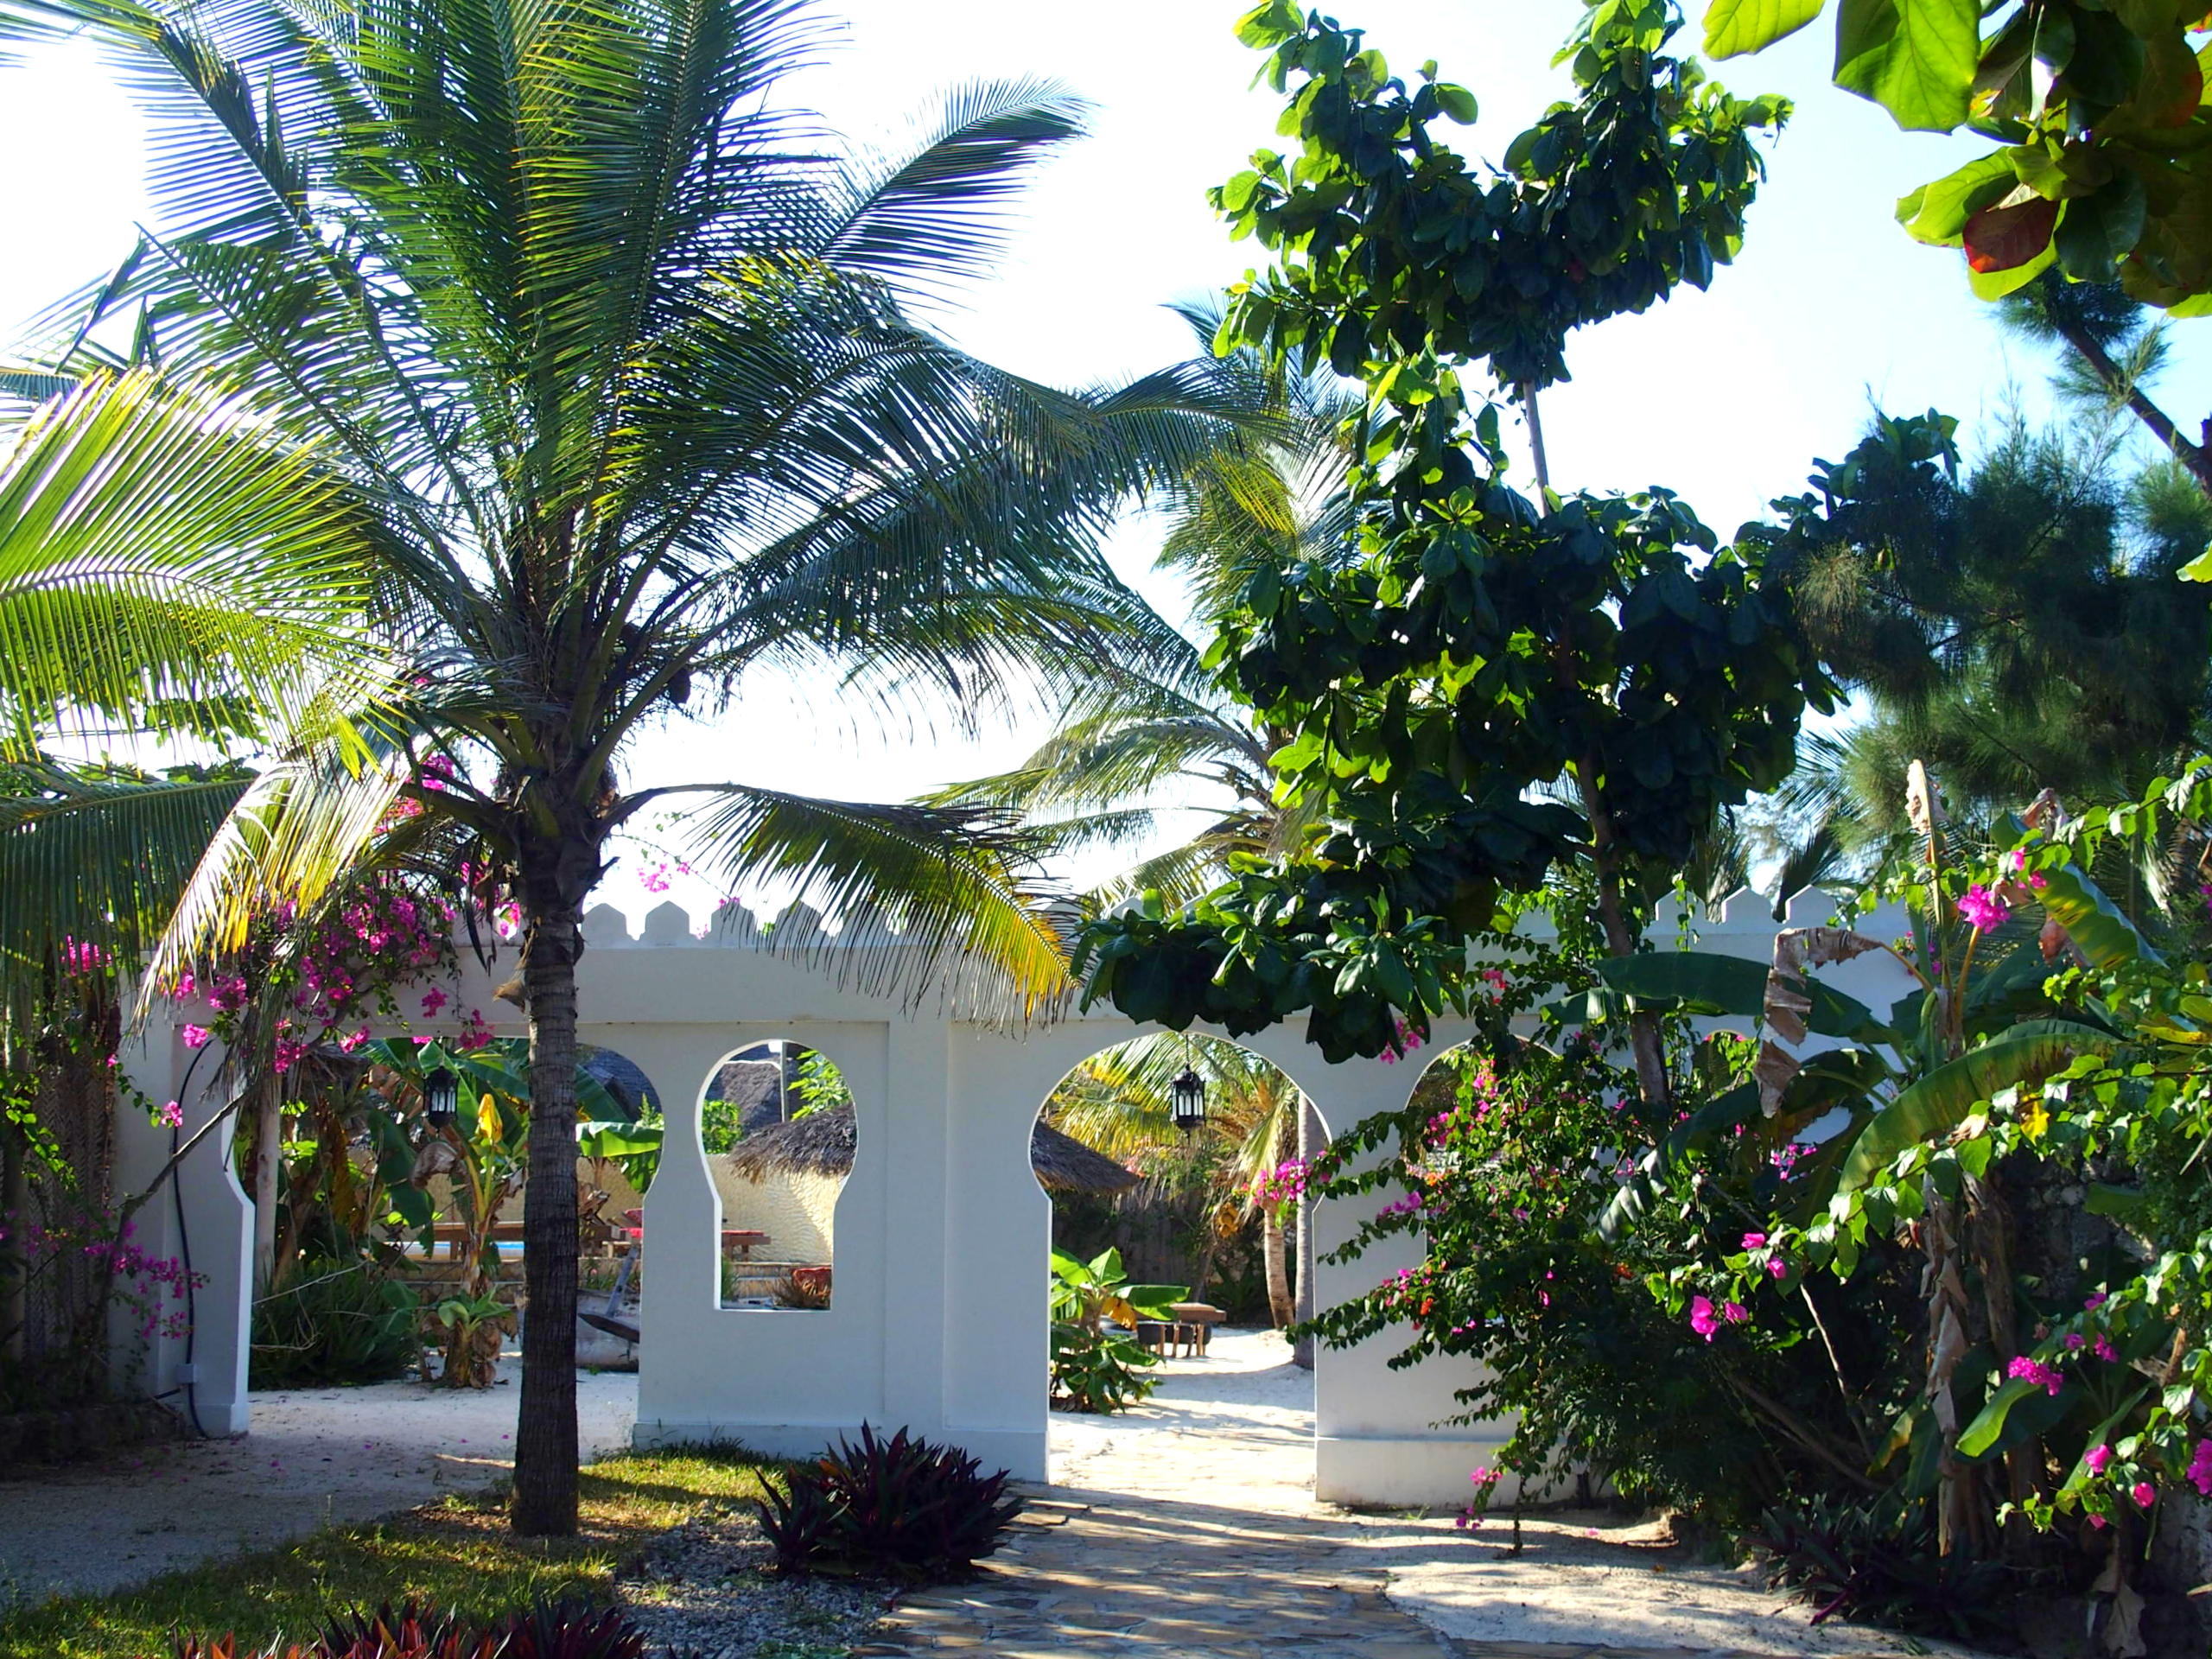 Jardins hotel Seasons lodge Pongwe Zanzibar